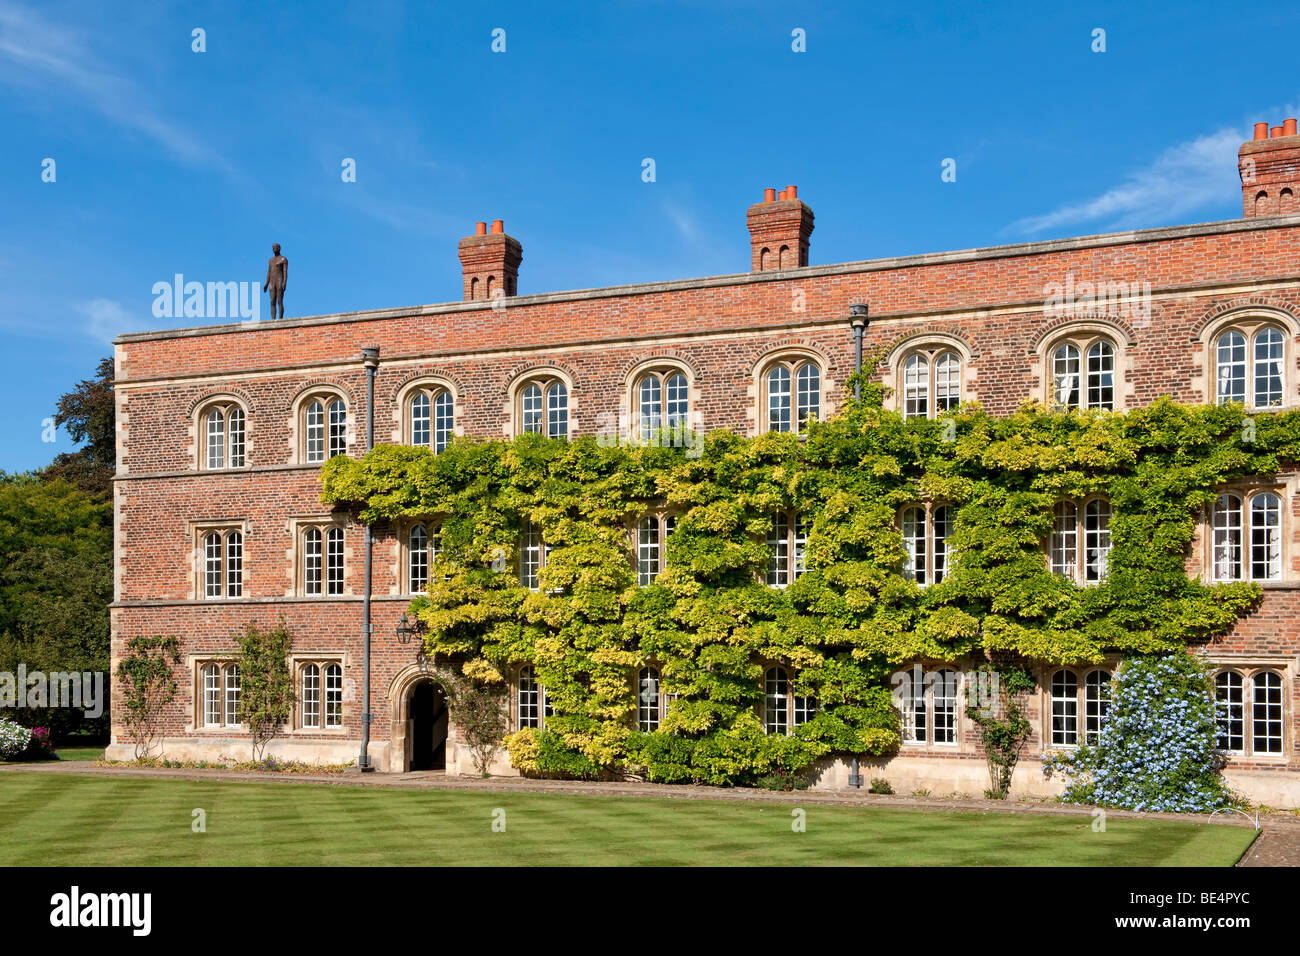 Part of Jesus College in Cambridge (Cambridge University) Stock Photo